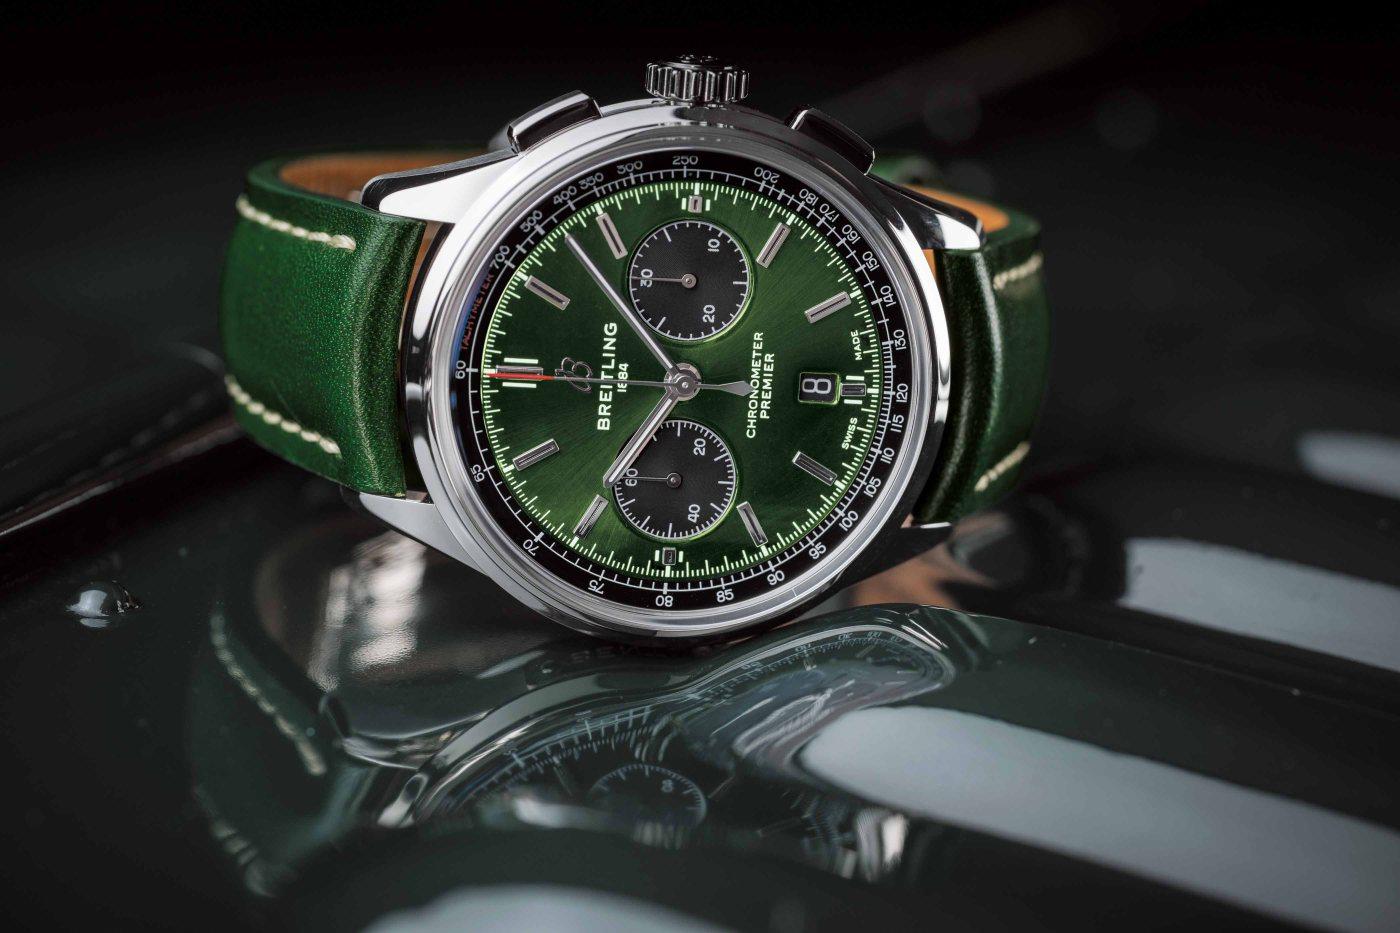 Breitling Premier B01 Chronograph 42 Bentley British Racing Green with a British racing green leather strap